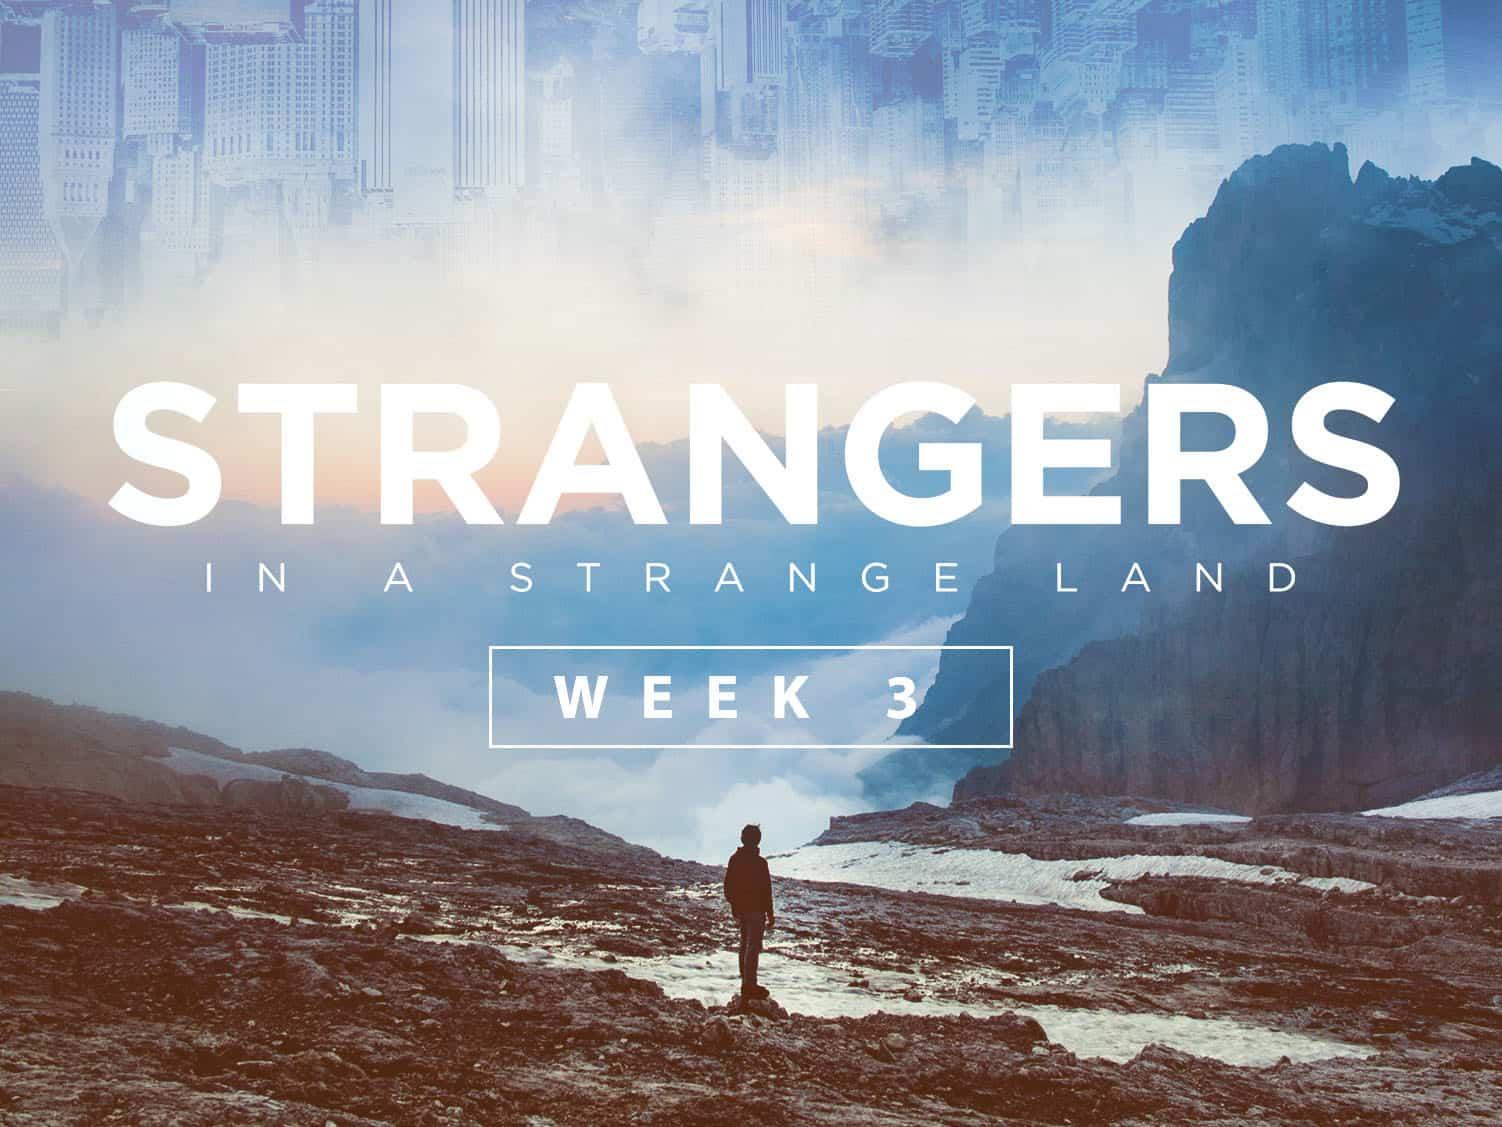 Strangers in a Strange Land: Week 3